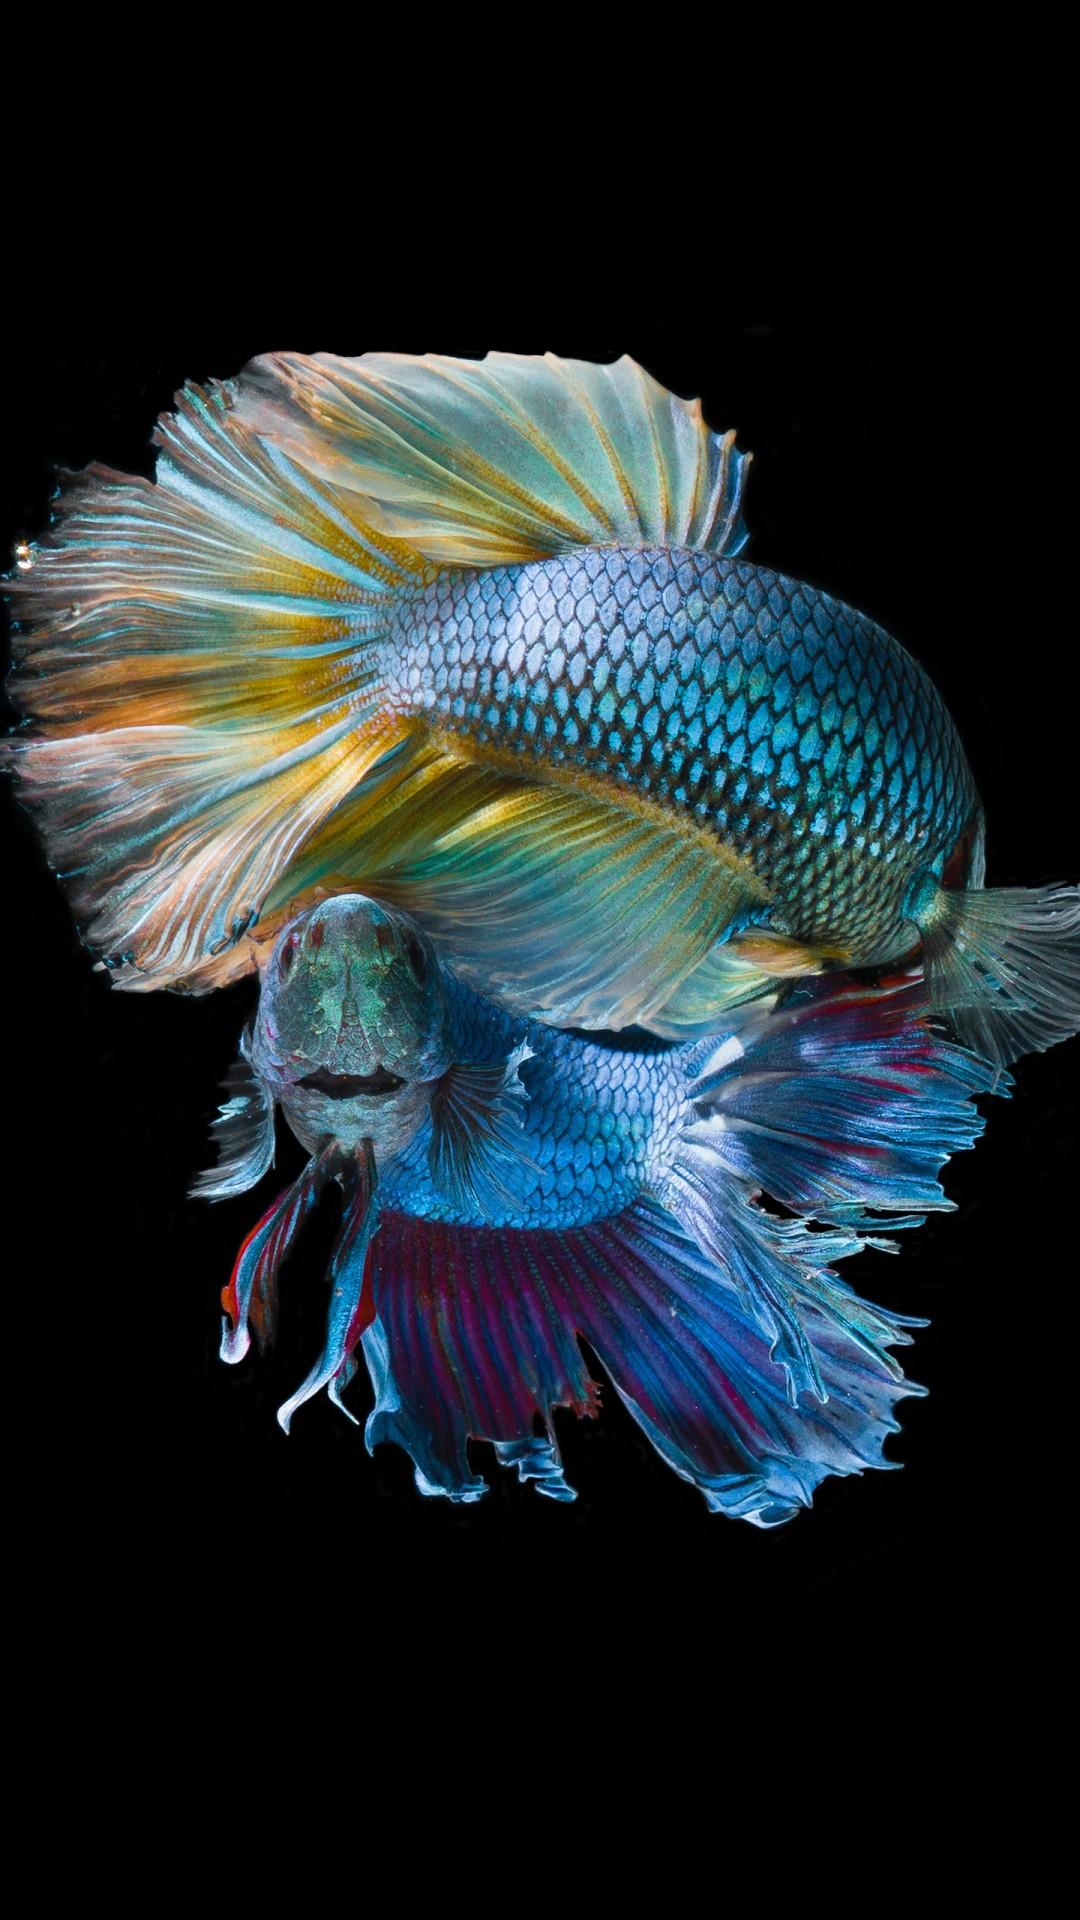 3d Fish Hd Live Wallpaper Underwater Fish 5k Wallpapers Hd Wallpapers Id 23678